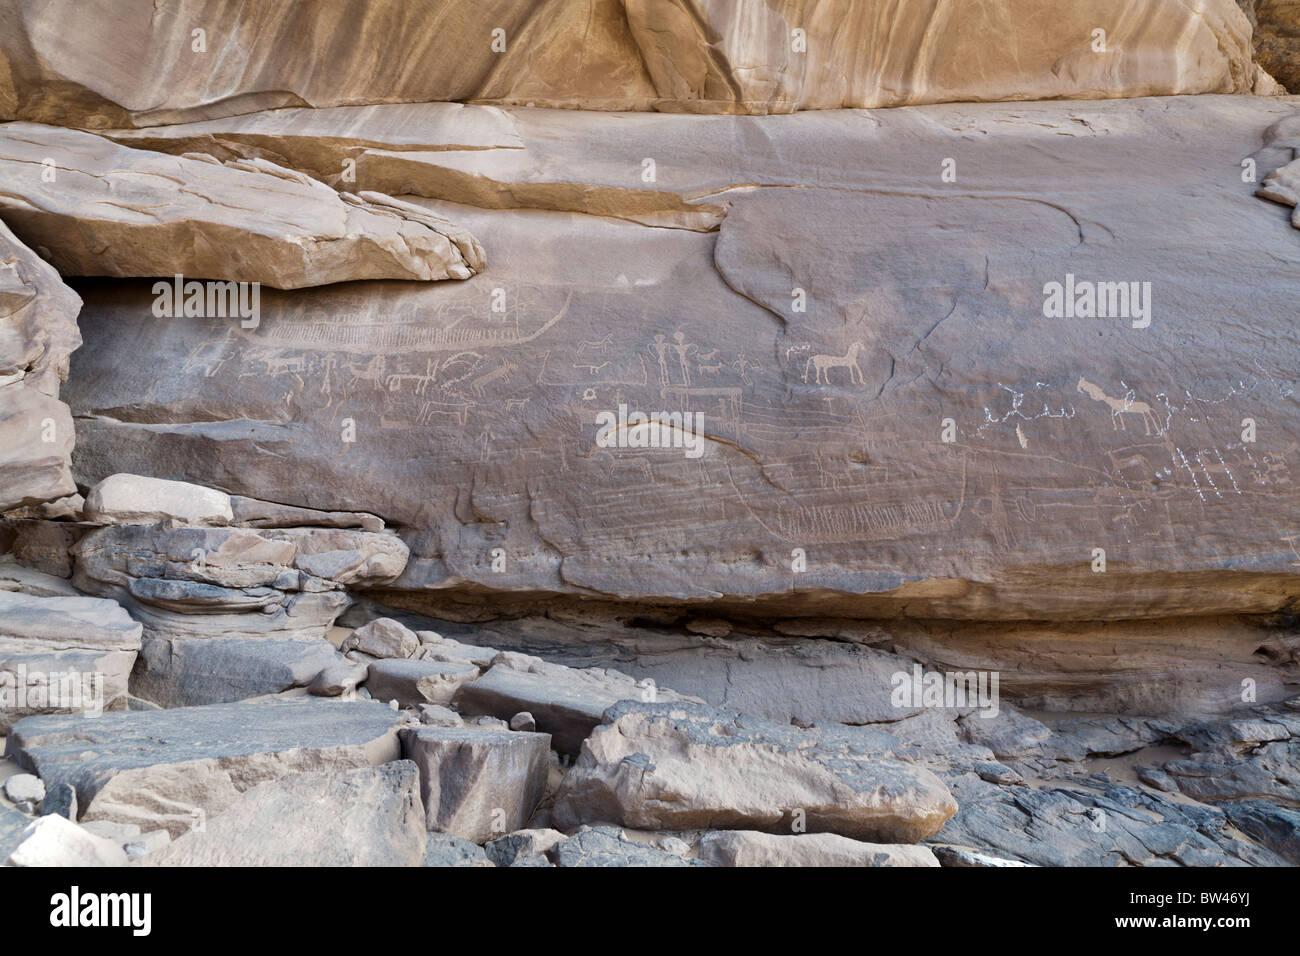 Petroglyph of large boat and various animals overlaid by modern painted graffiti, Wadi el-Barramiya, Eastern Desert, - Stock Image